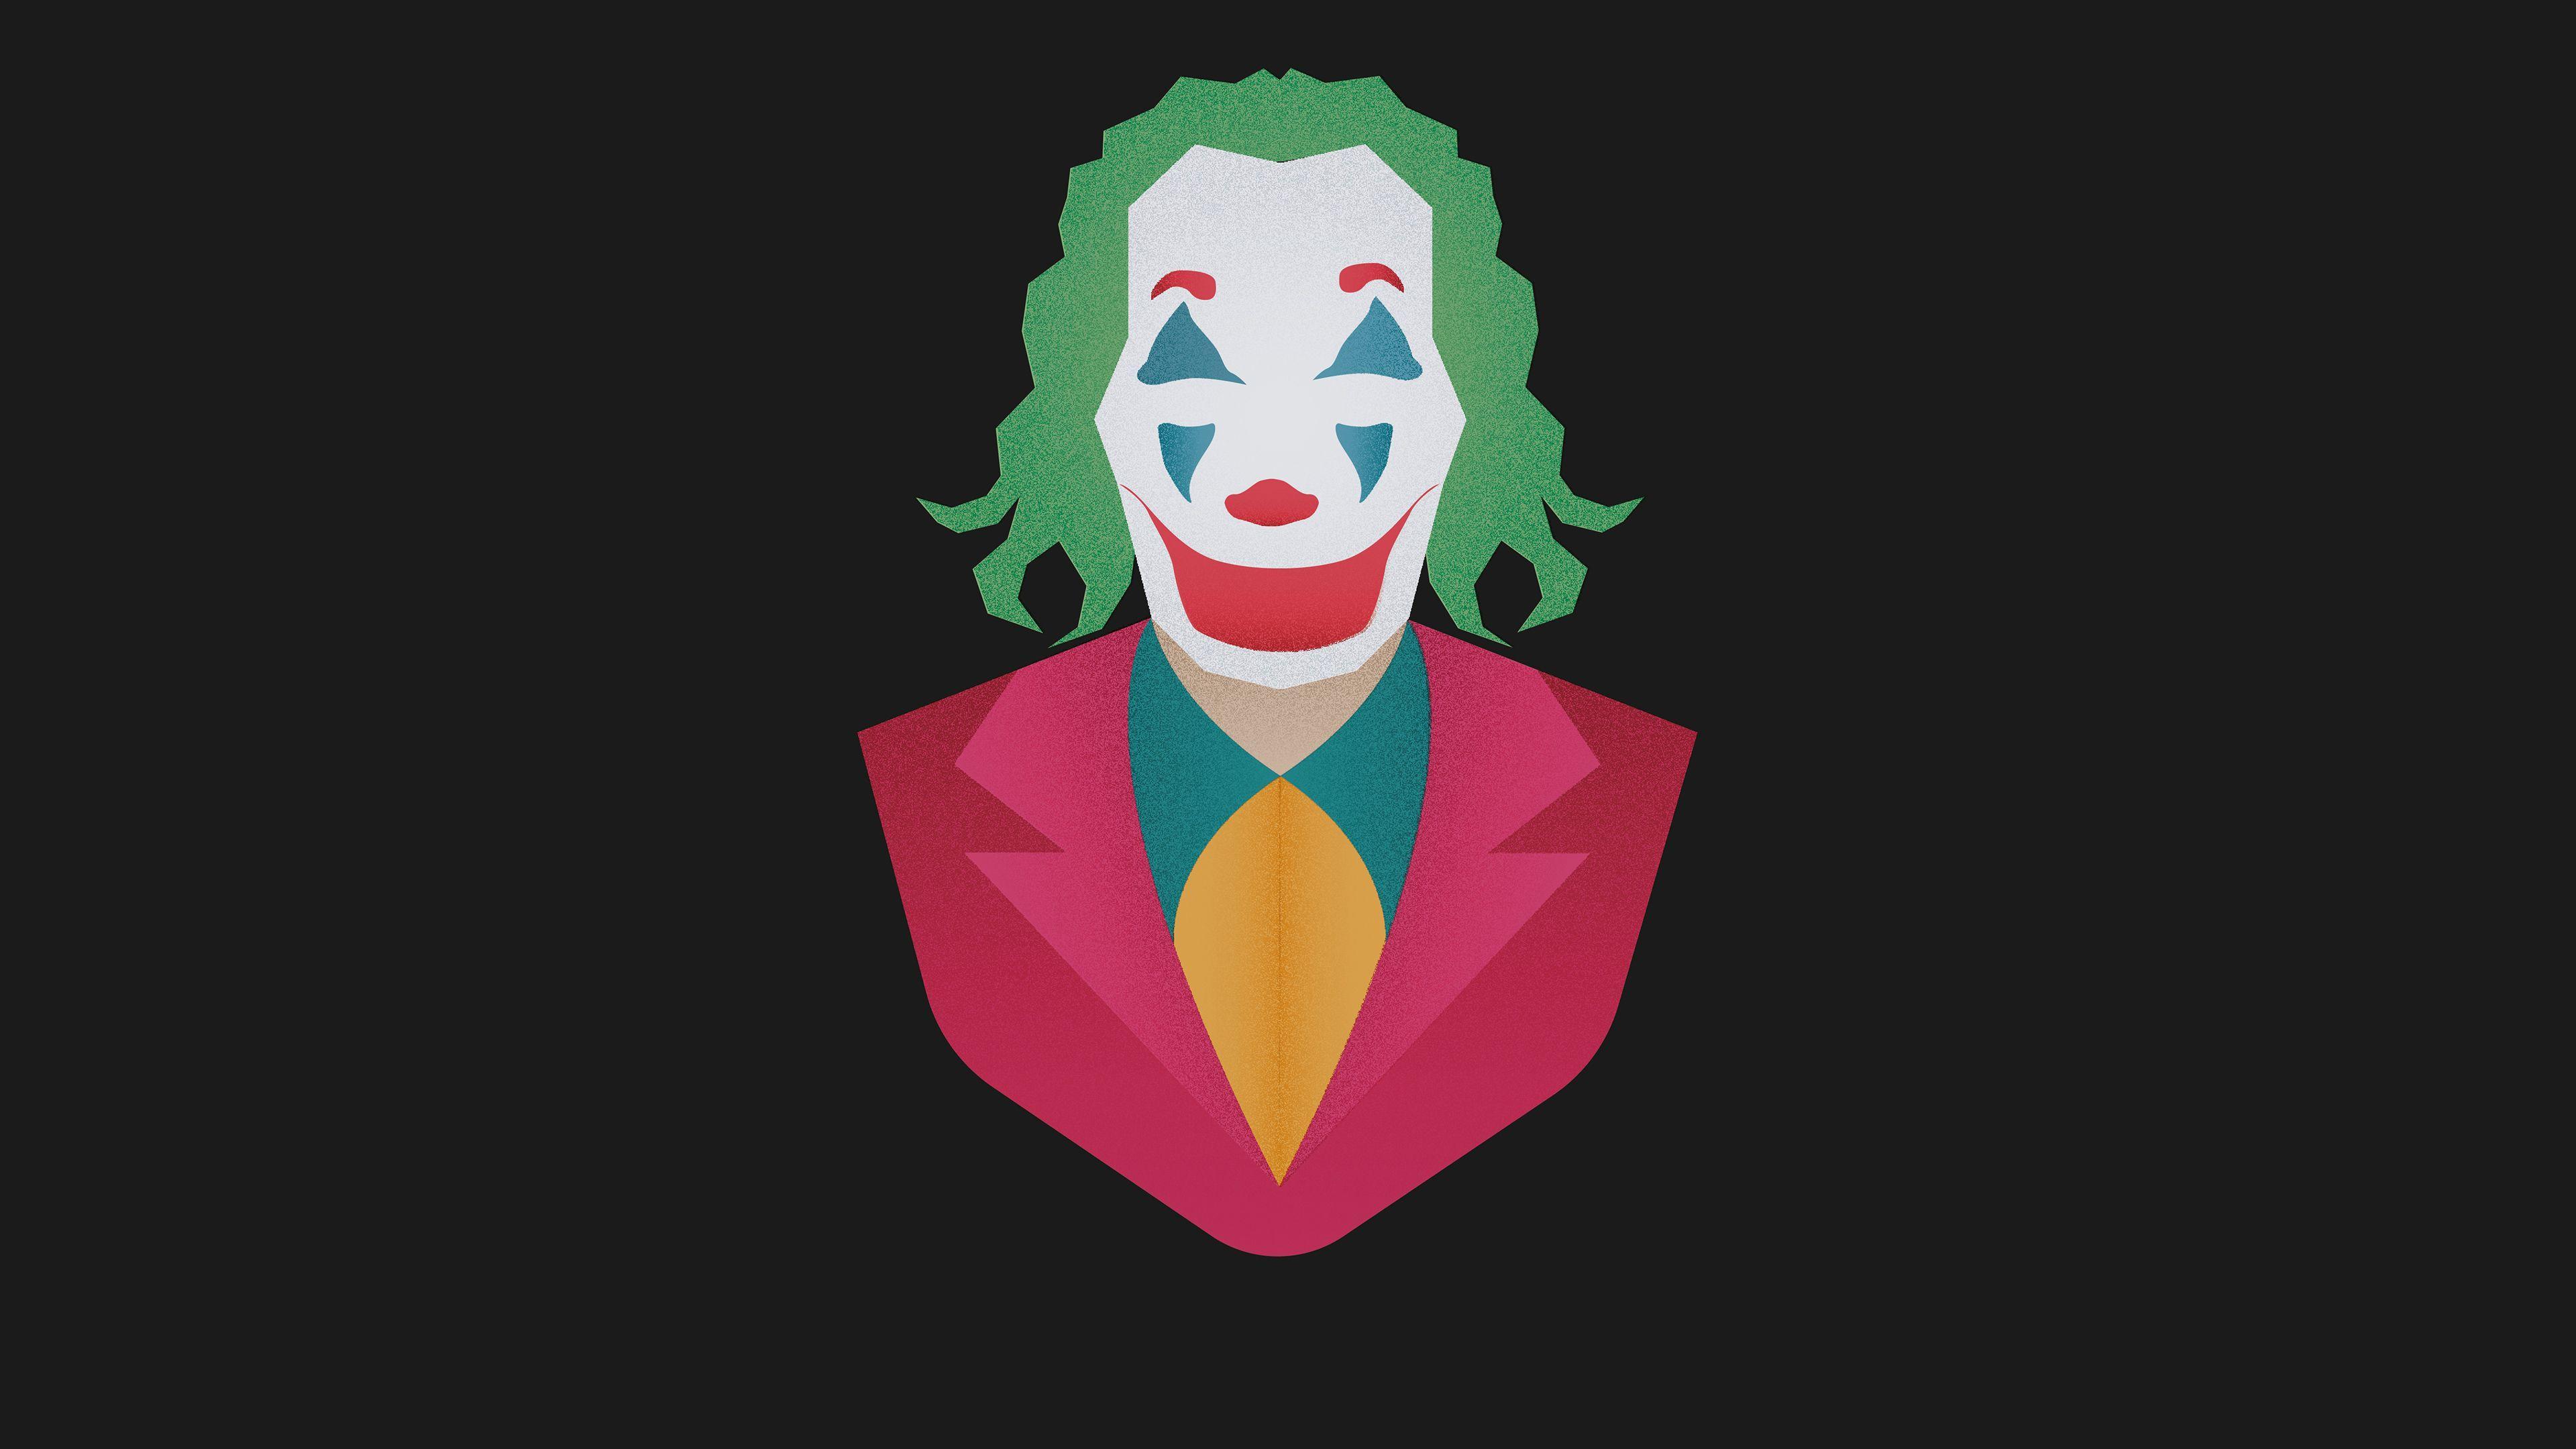 Minimalist Joker Wallpapers Top Free Minimalist Joker Backgrounds Wallpaperaccess